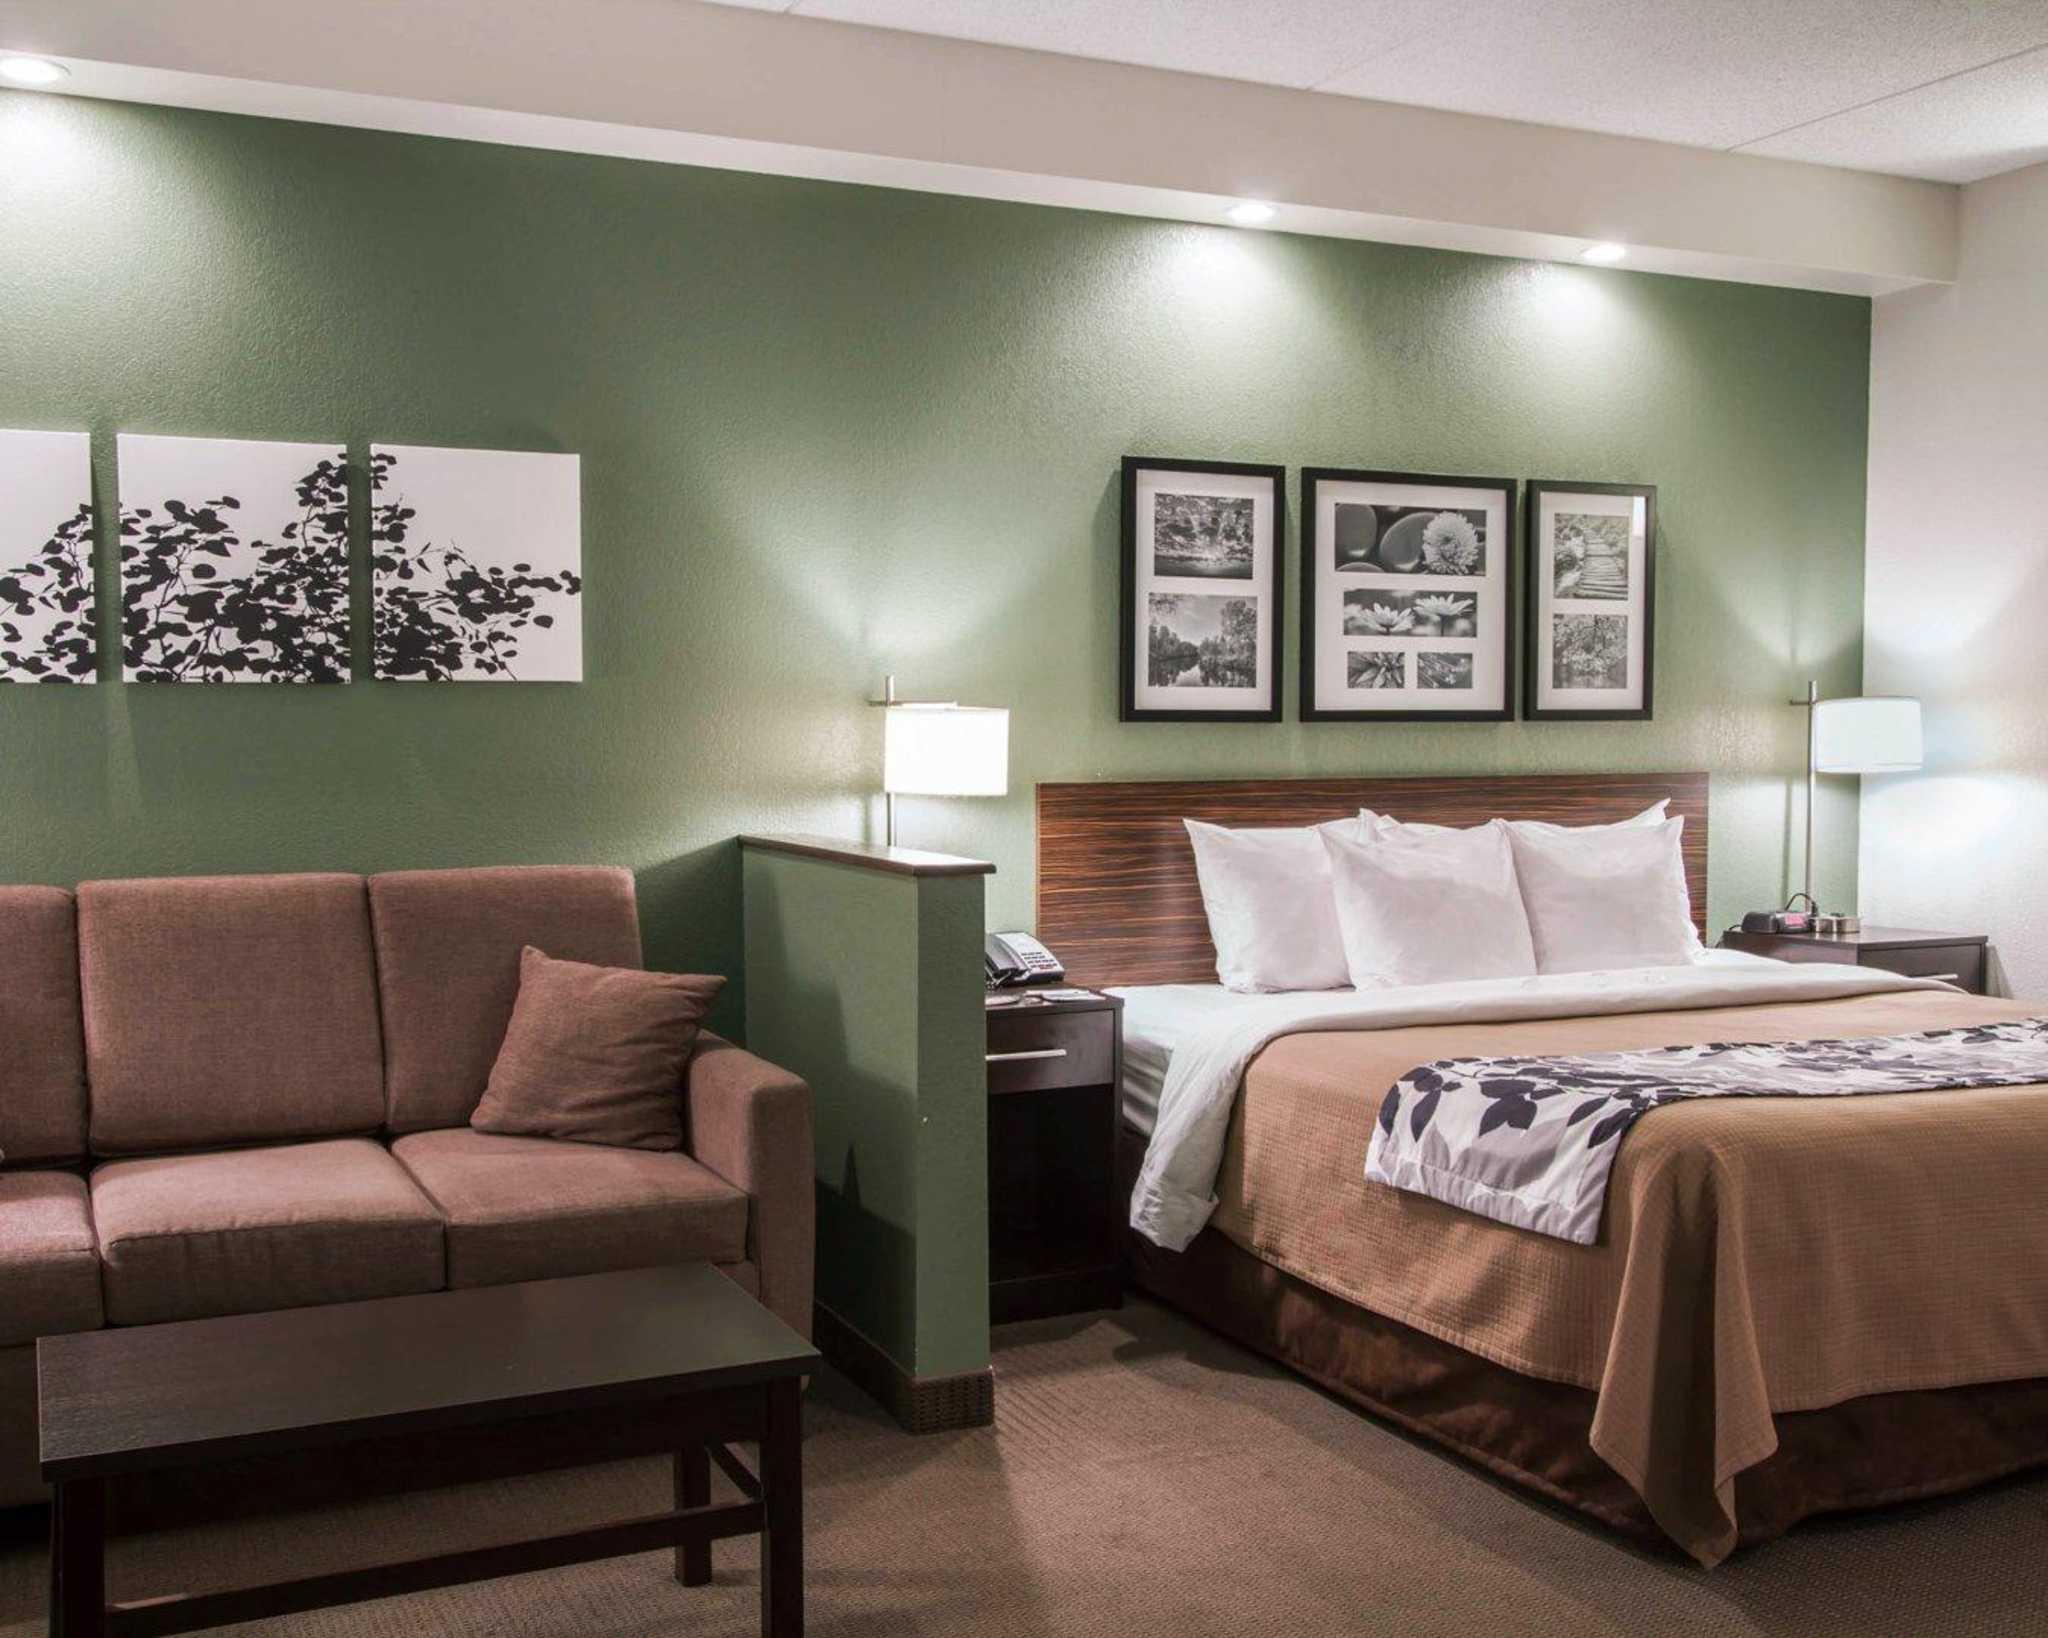 Sleep Inn & Suites Buffalo Airport image 9